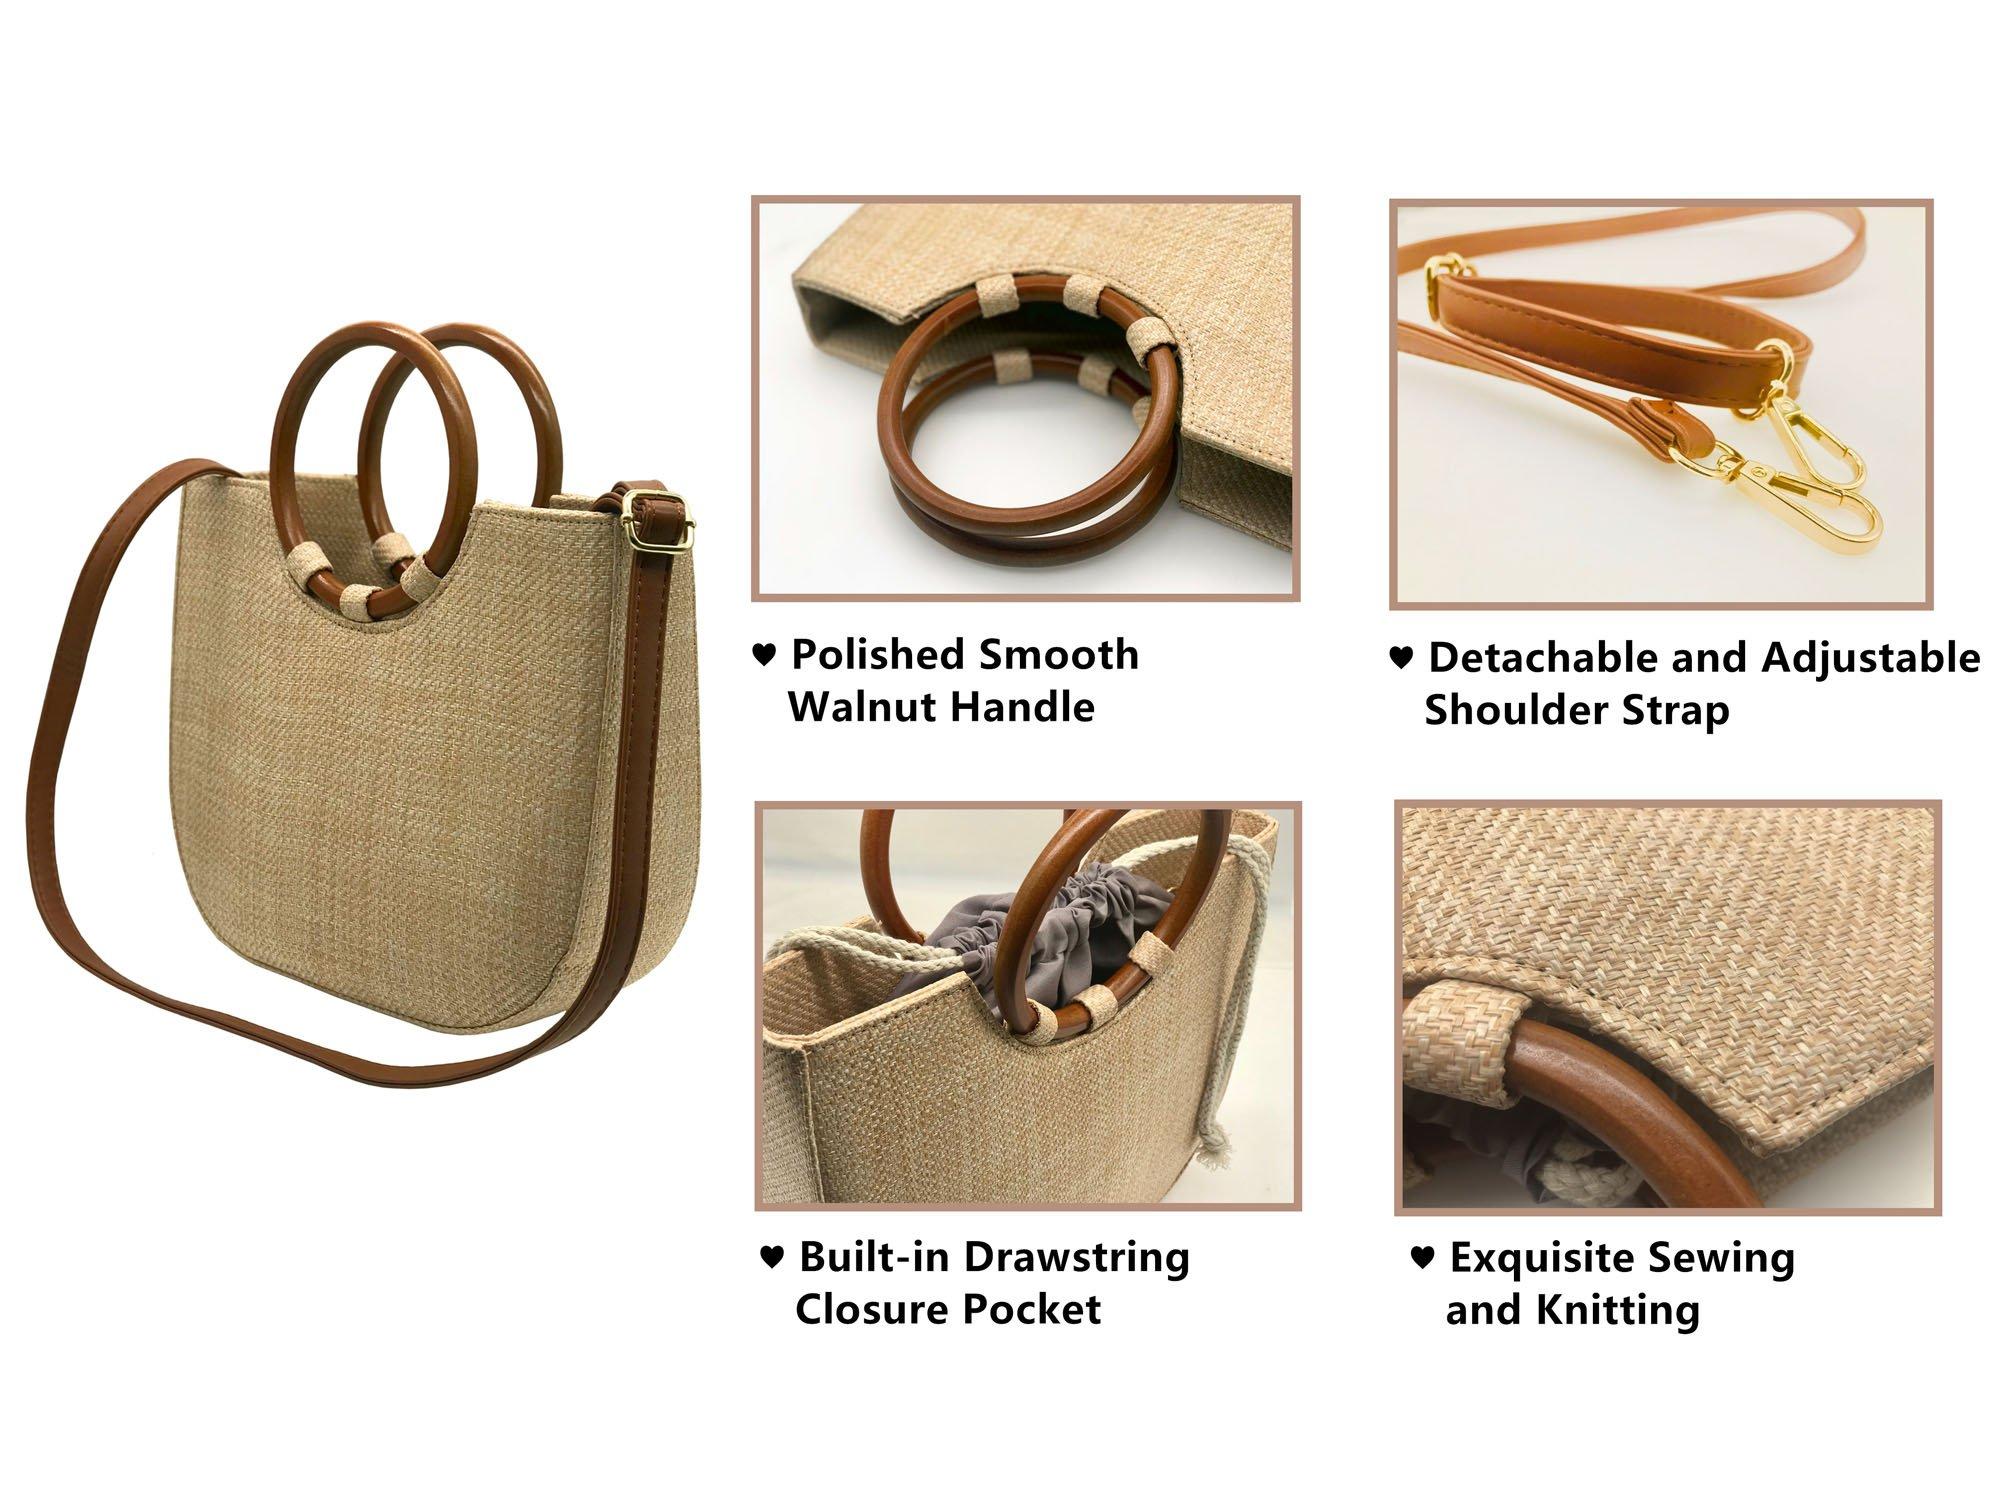 Youndcc Women Woven Straw Bag Rattan Bag Tote Bag Shoulder Bag Crossbody Bag Handbag Beach Bag, Handwoven/Crochet/Round Handle by Youndcc (Image #4)